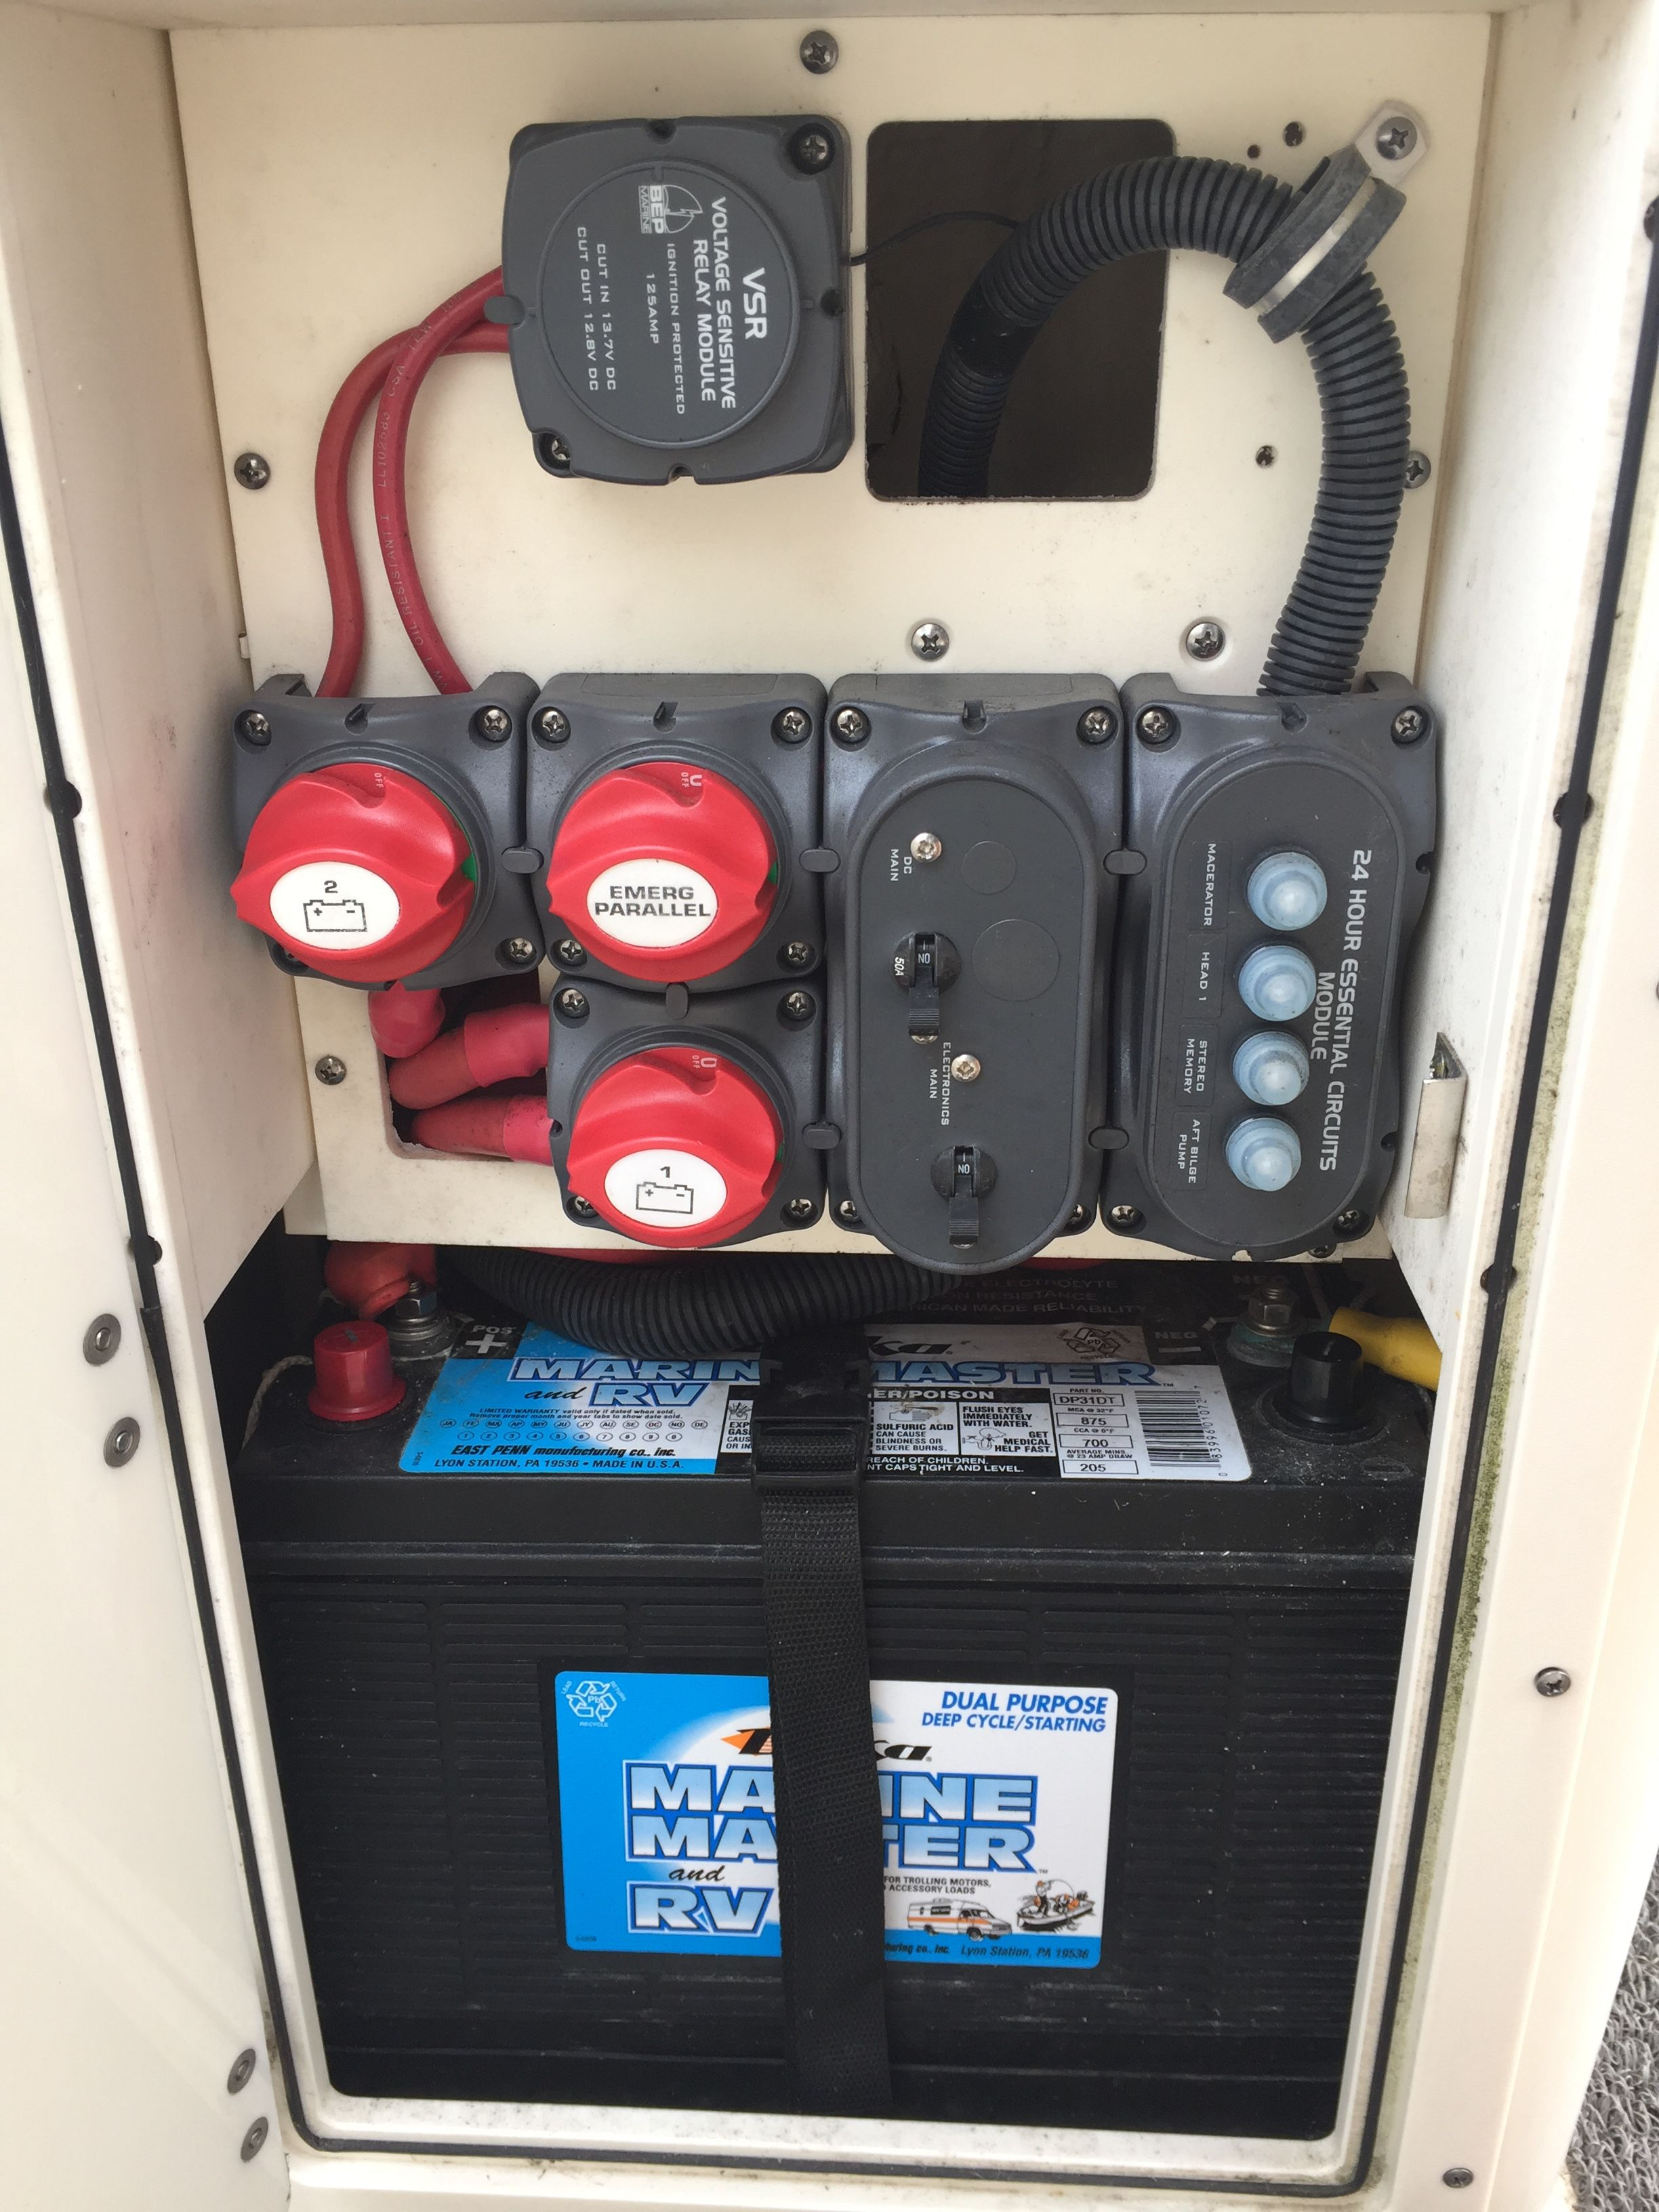 voltage sensing relay wiring diagram hyundai excel ecu bep sensitive free download